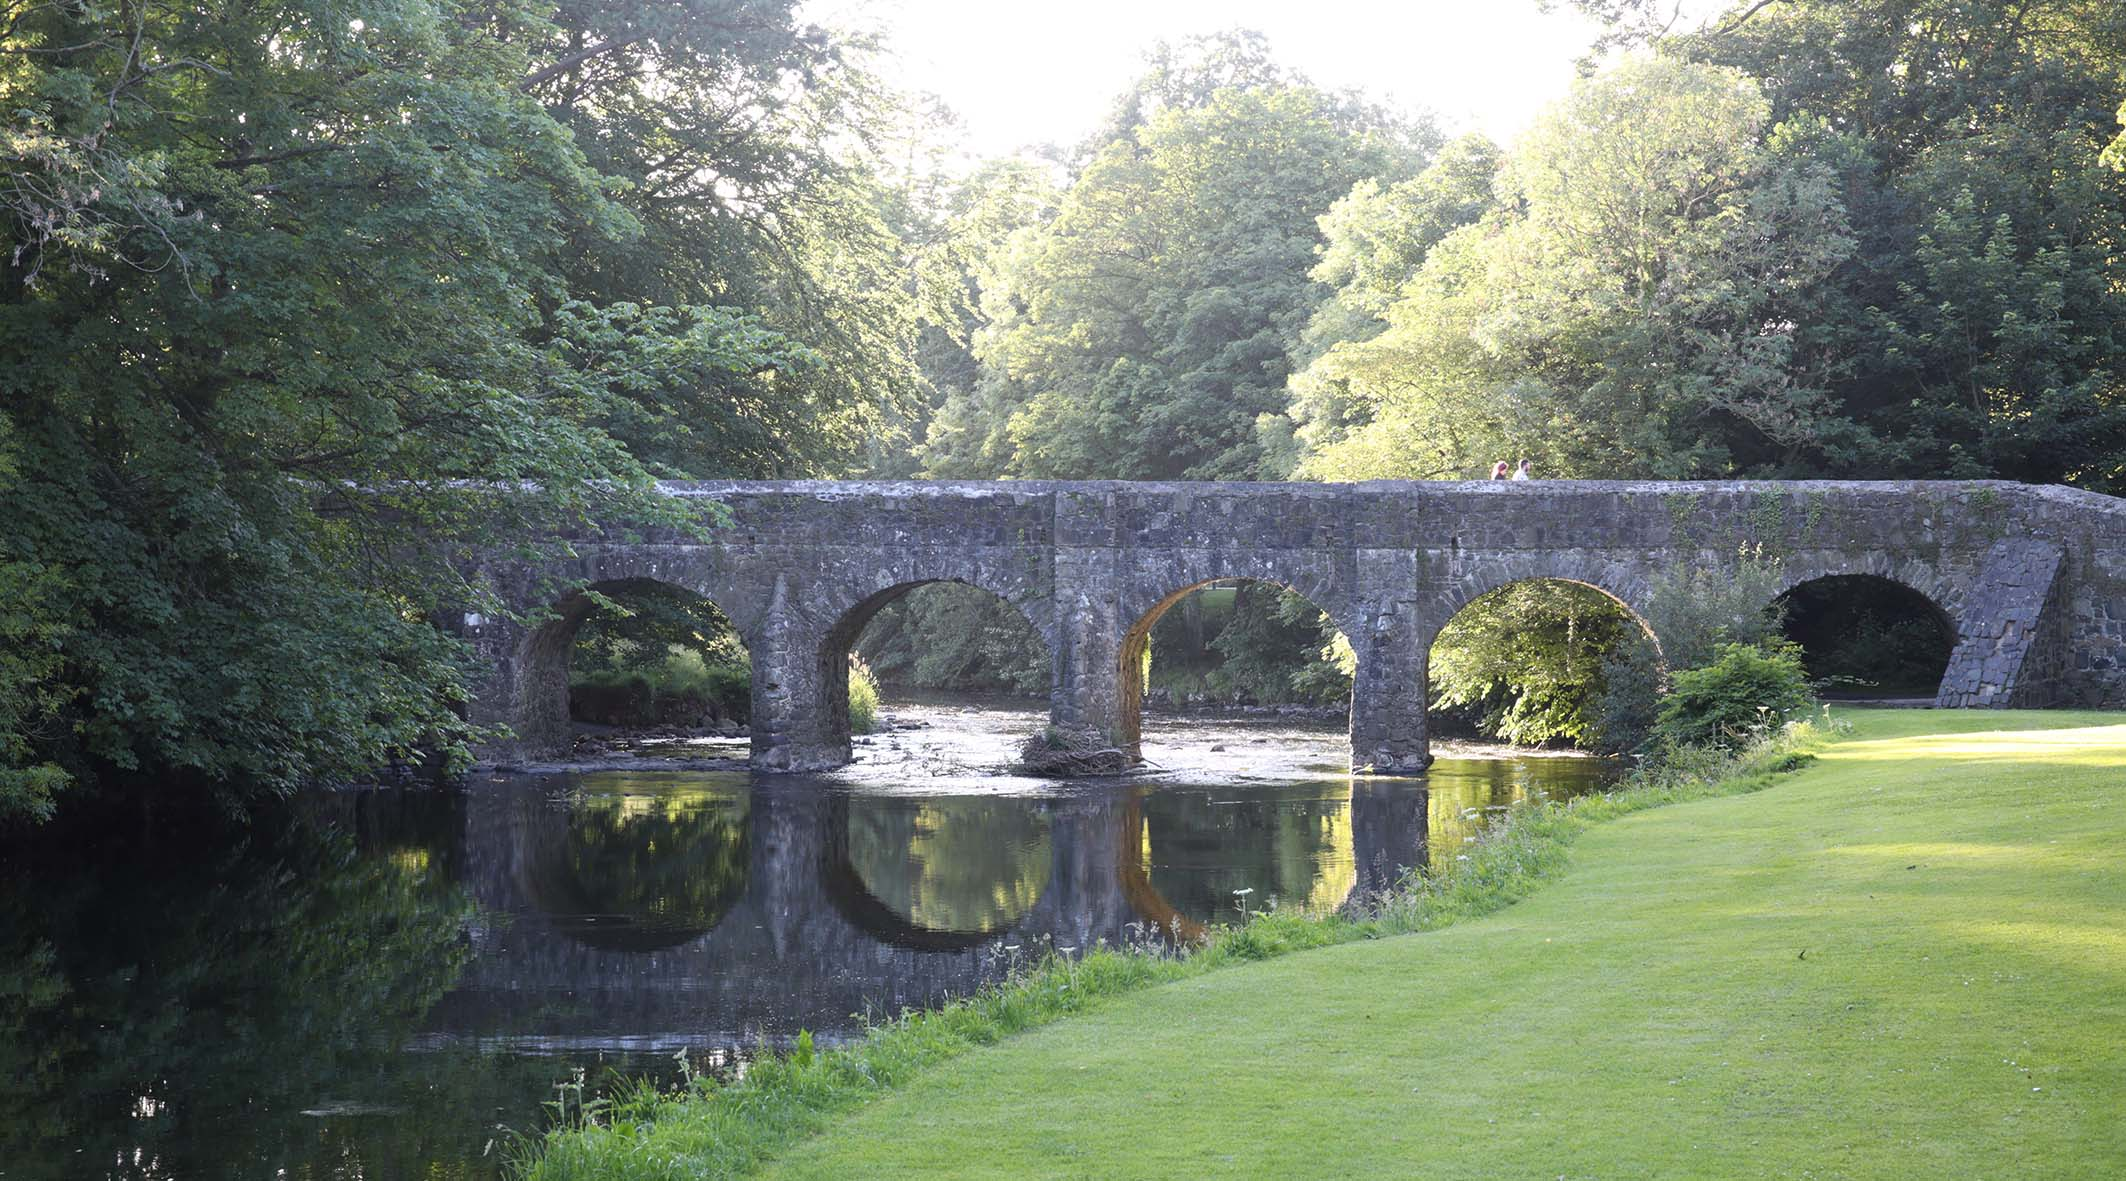 Deerpark Bridge, Antrim